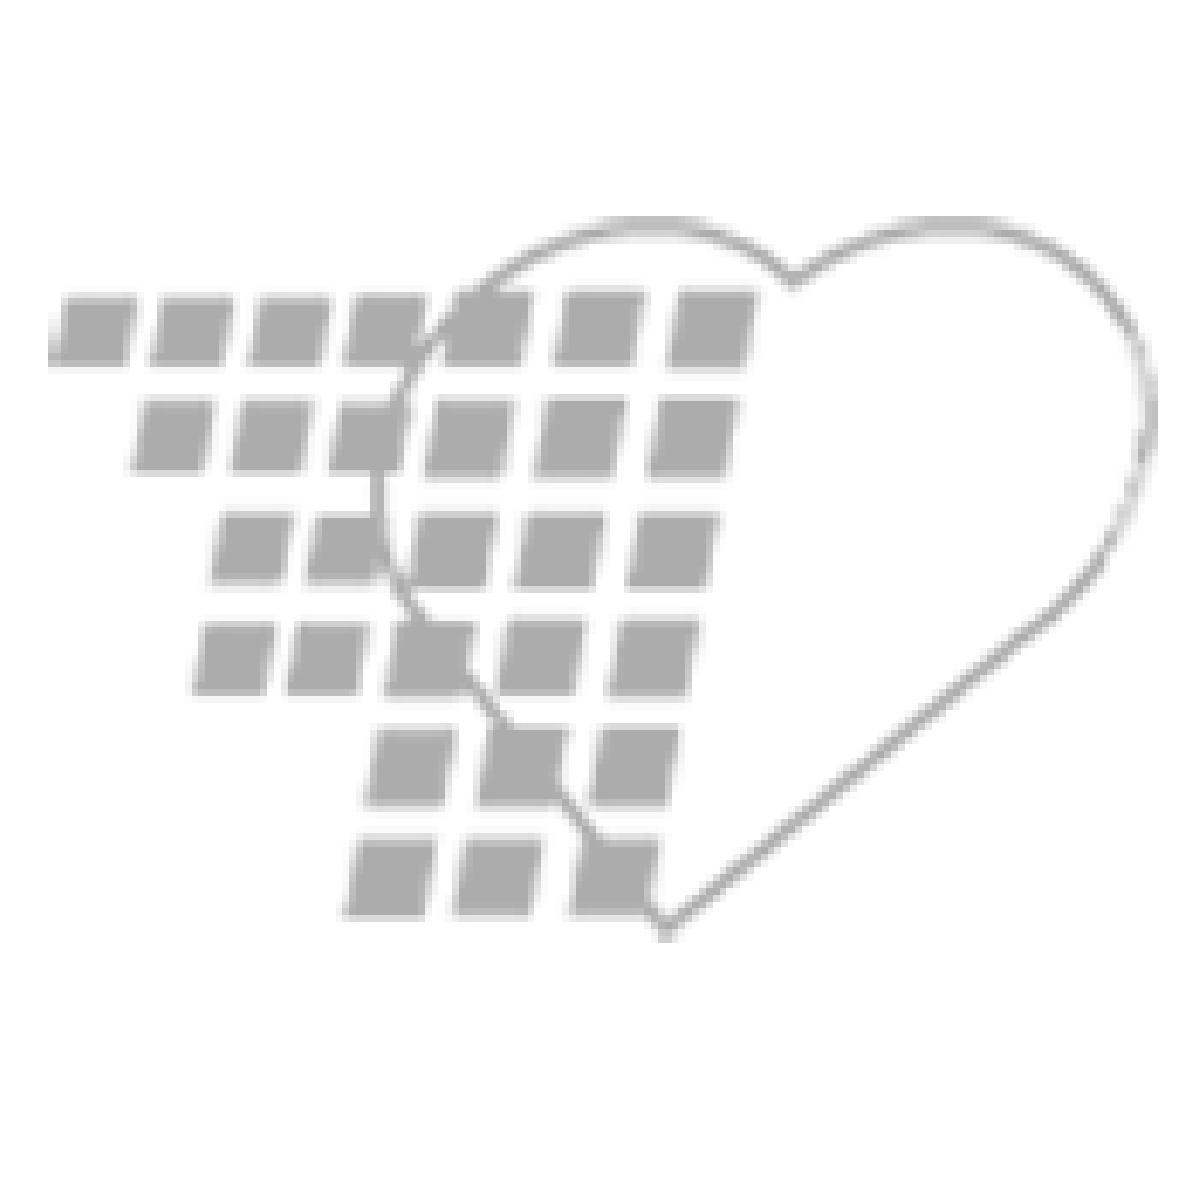 06-93-0096 - Demo Dose® Sertralin 50 mg - 1000 Pills/Jar